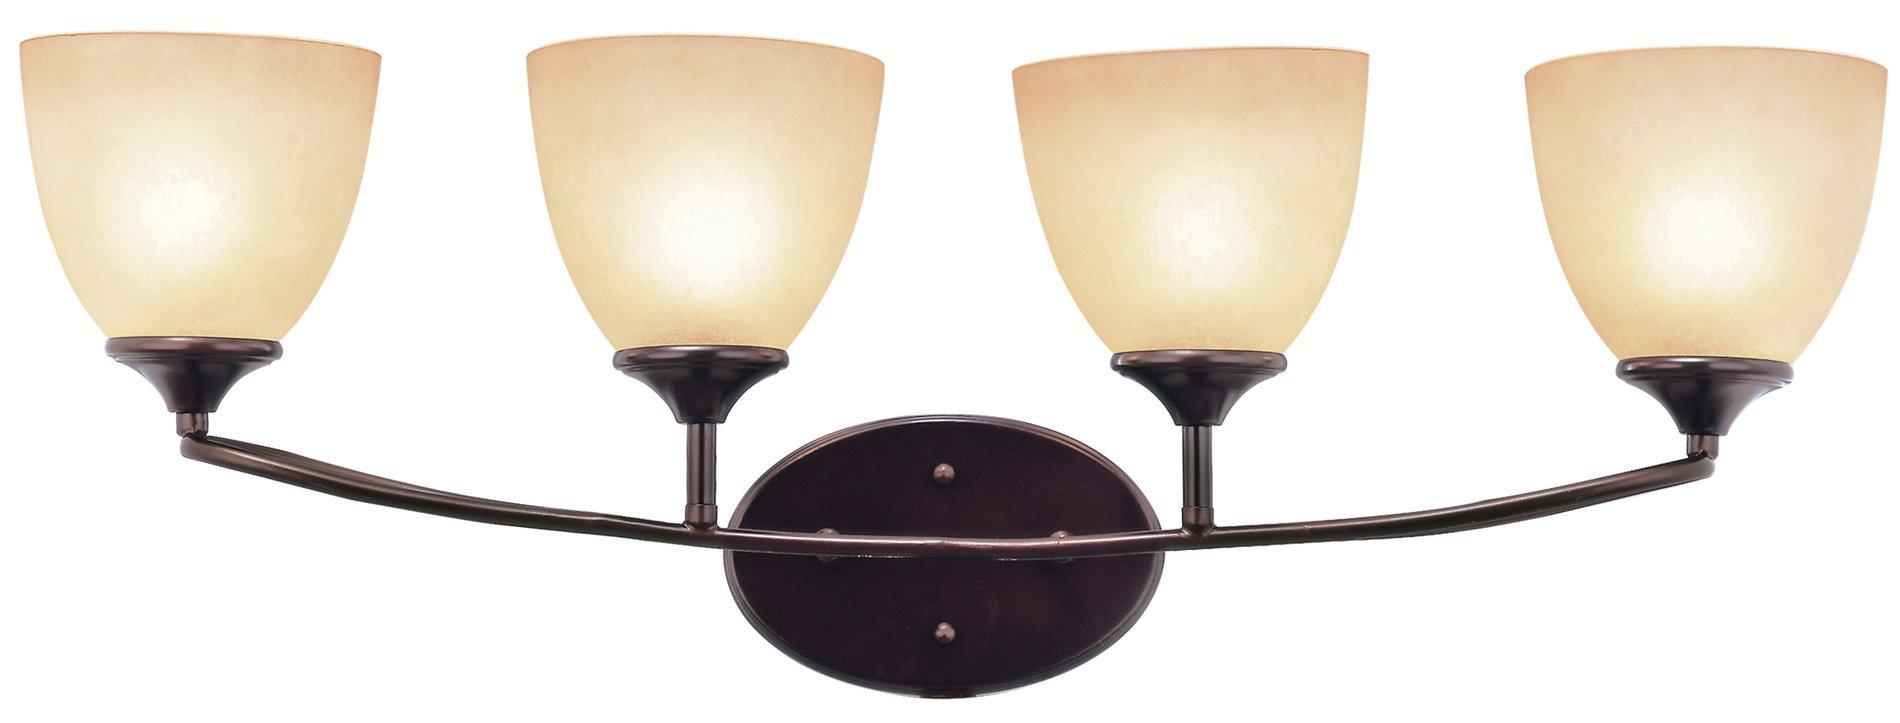 Pullman Bath Light: Trans Globe Lighting 70374 ROB Pullman Modern